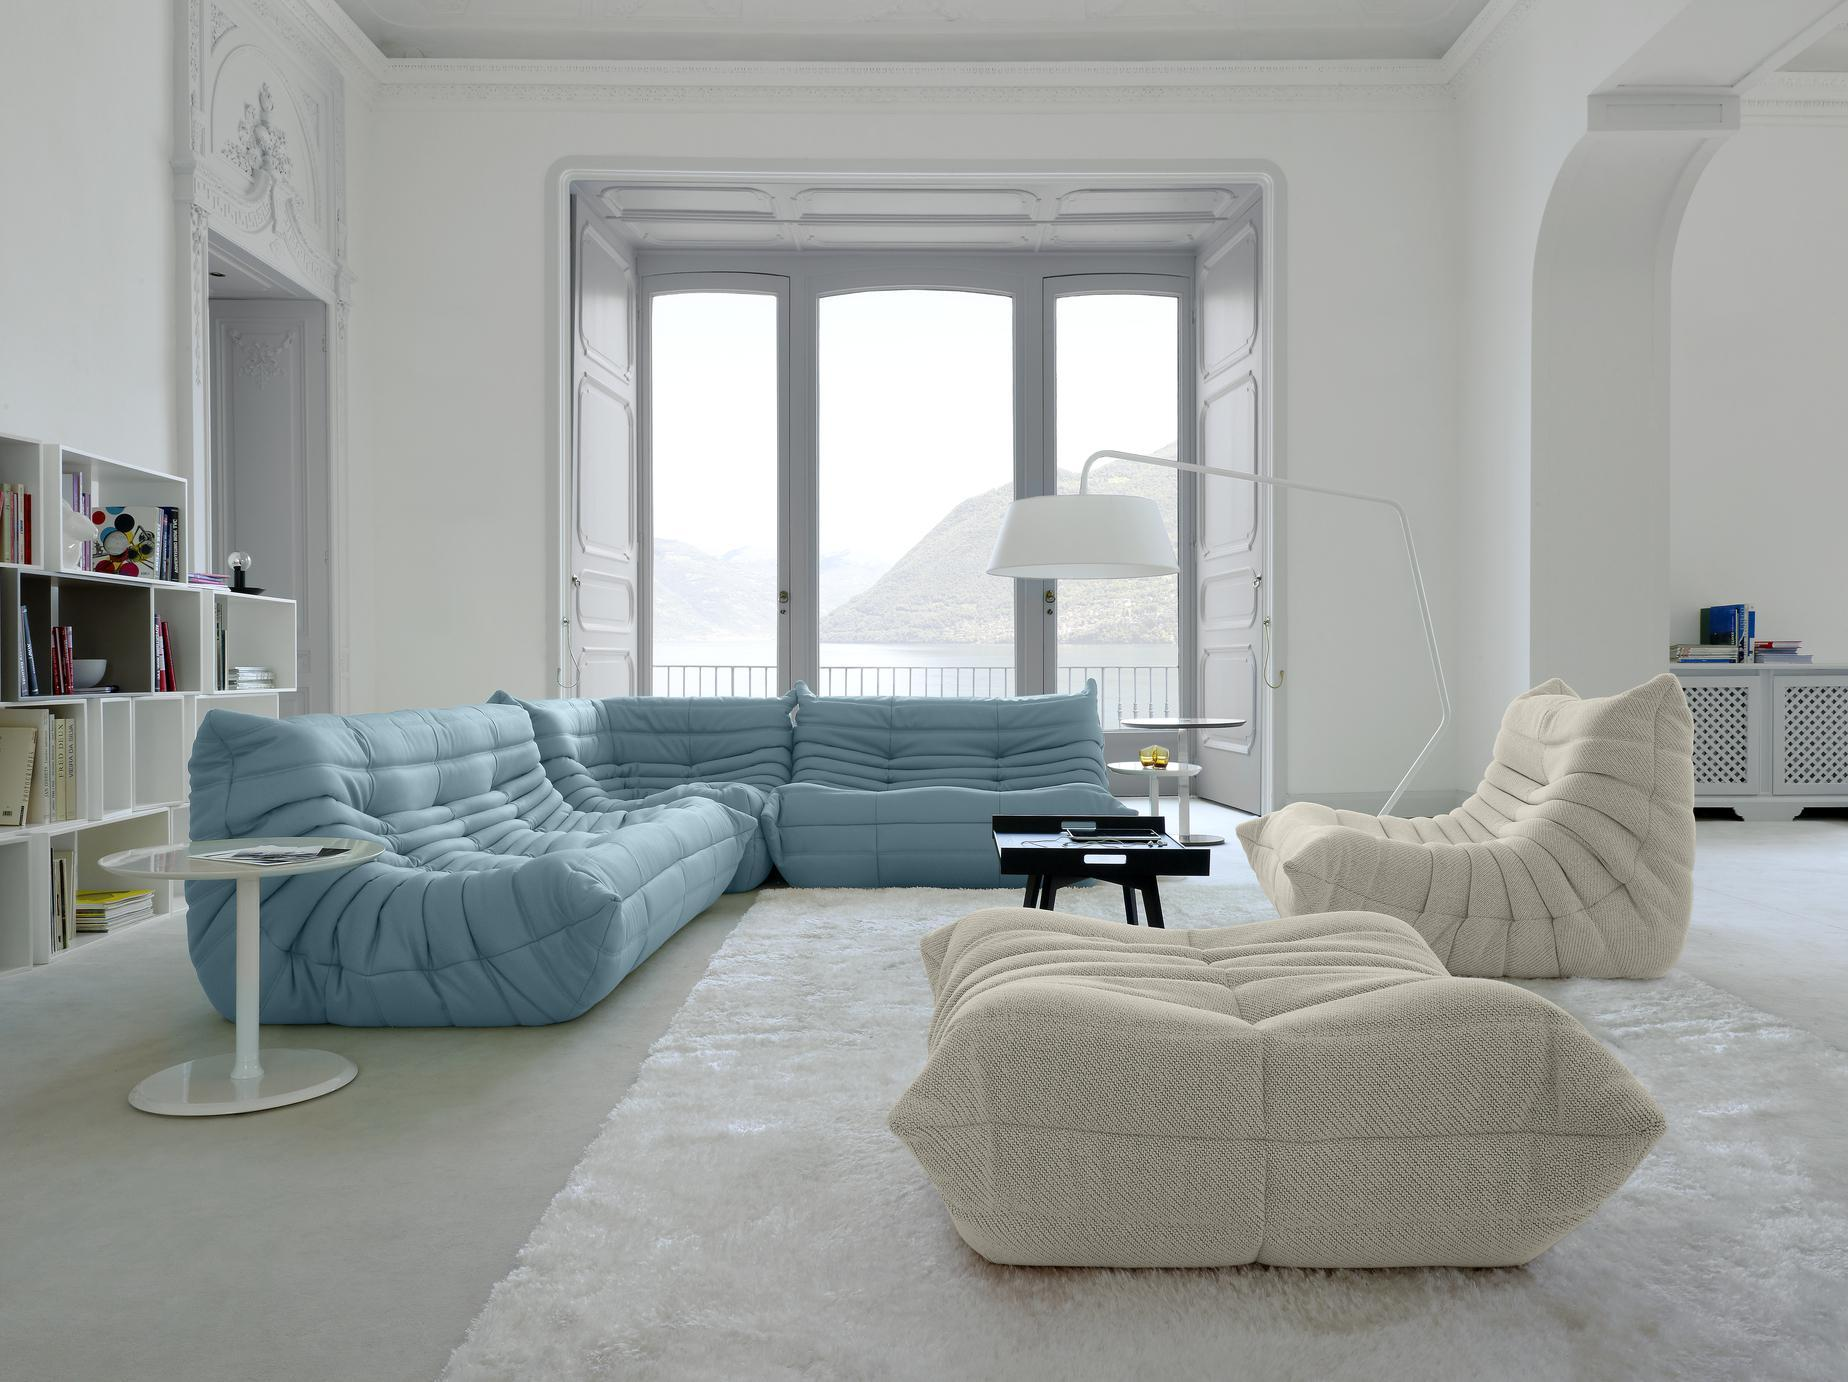 ligne roset 4 piece togo sofa in chic grey microsuede for sale at rh 1stdibs com ligne roset togo sofa dimensions ligne roset togo sofa cleaning